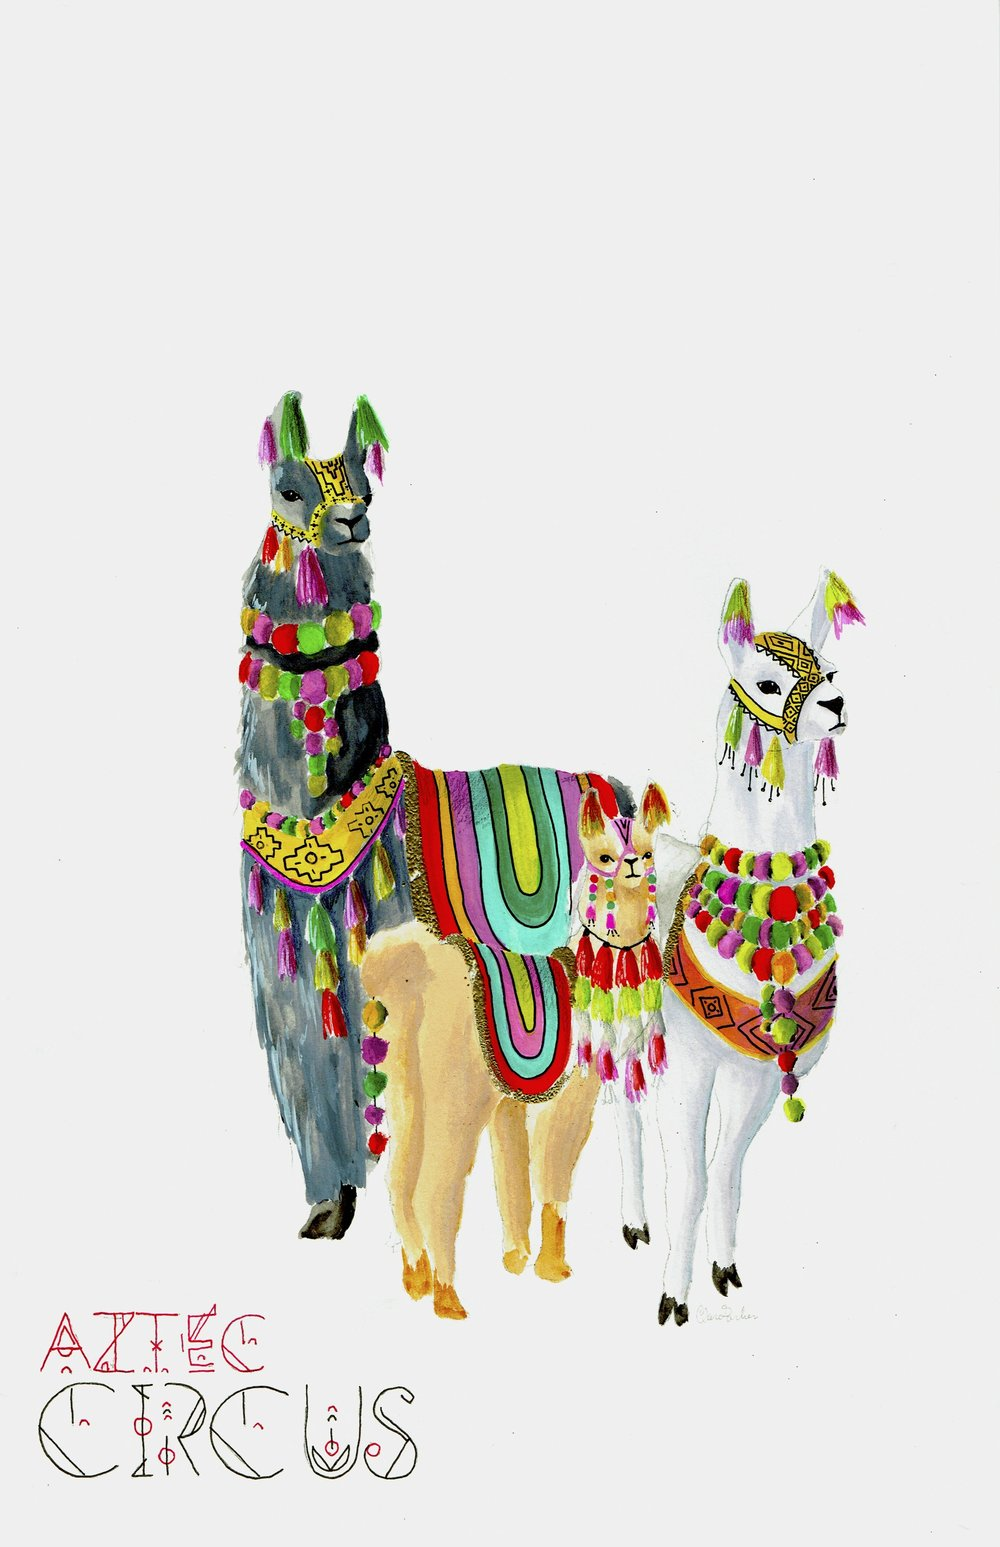 Aztec Circus Alpaca.jpg